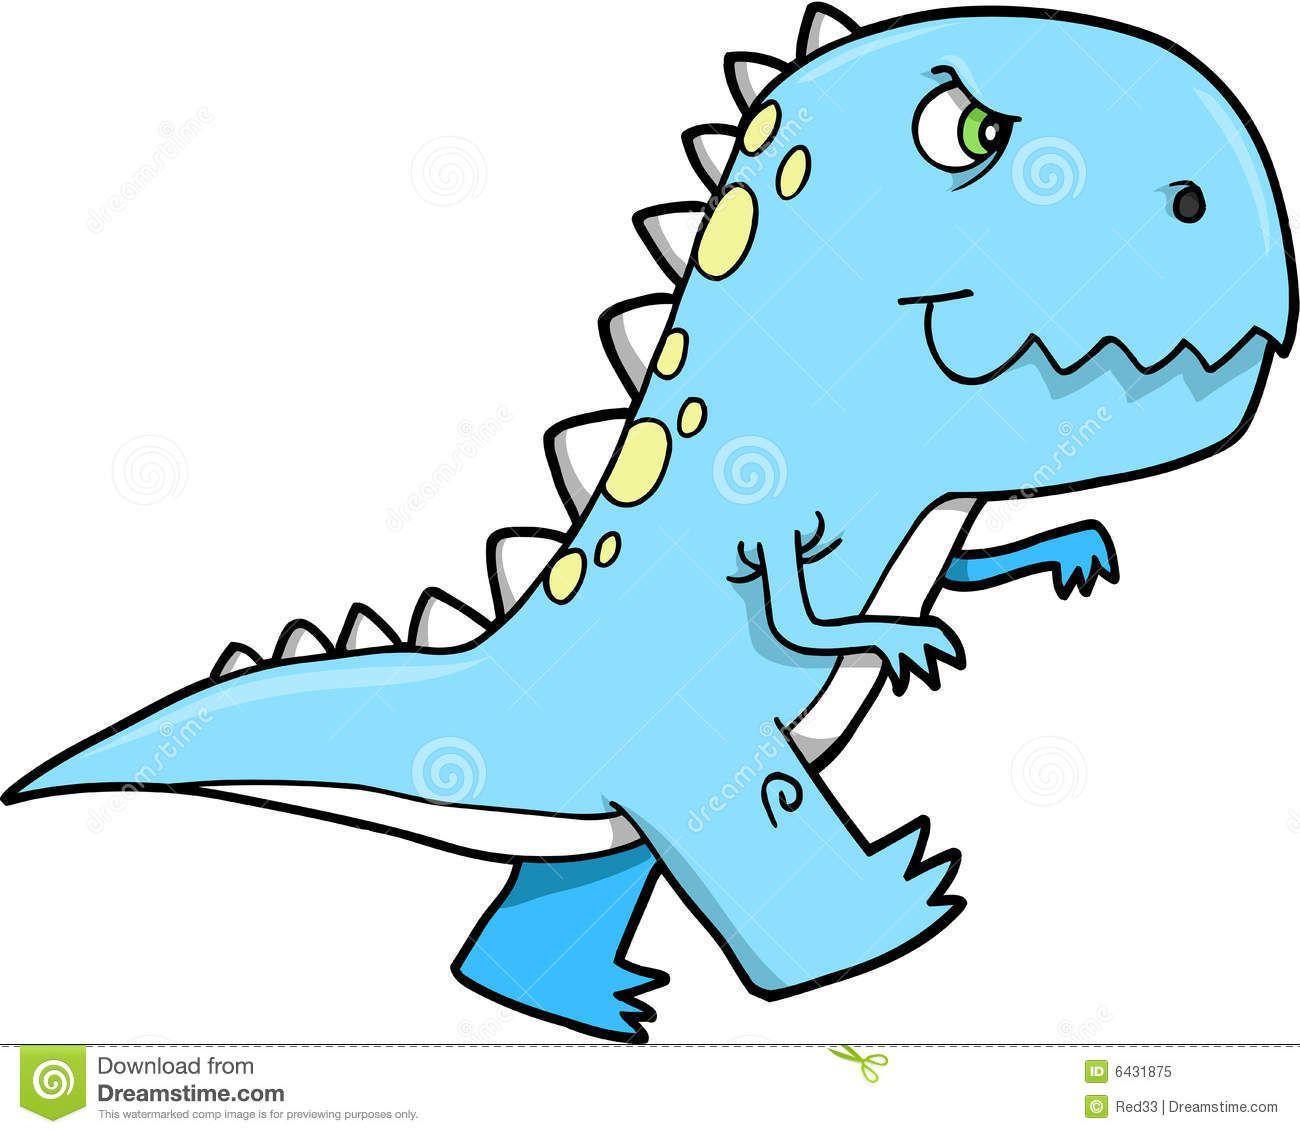 Trex cartoon baby dinosaur. Babies clipart t rex